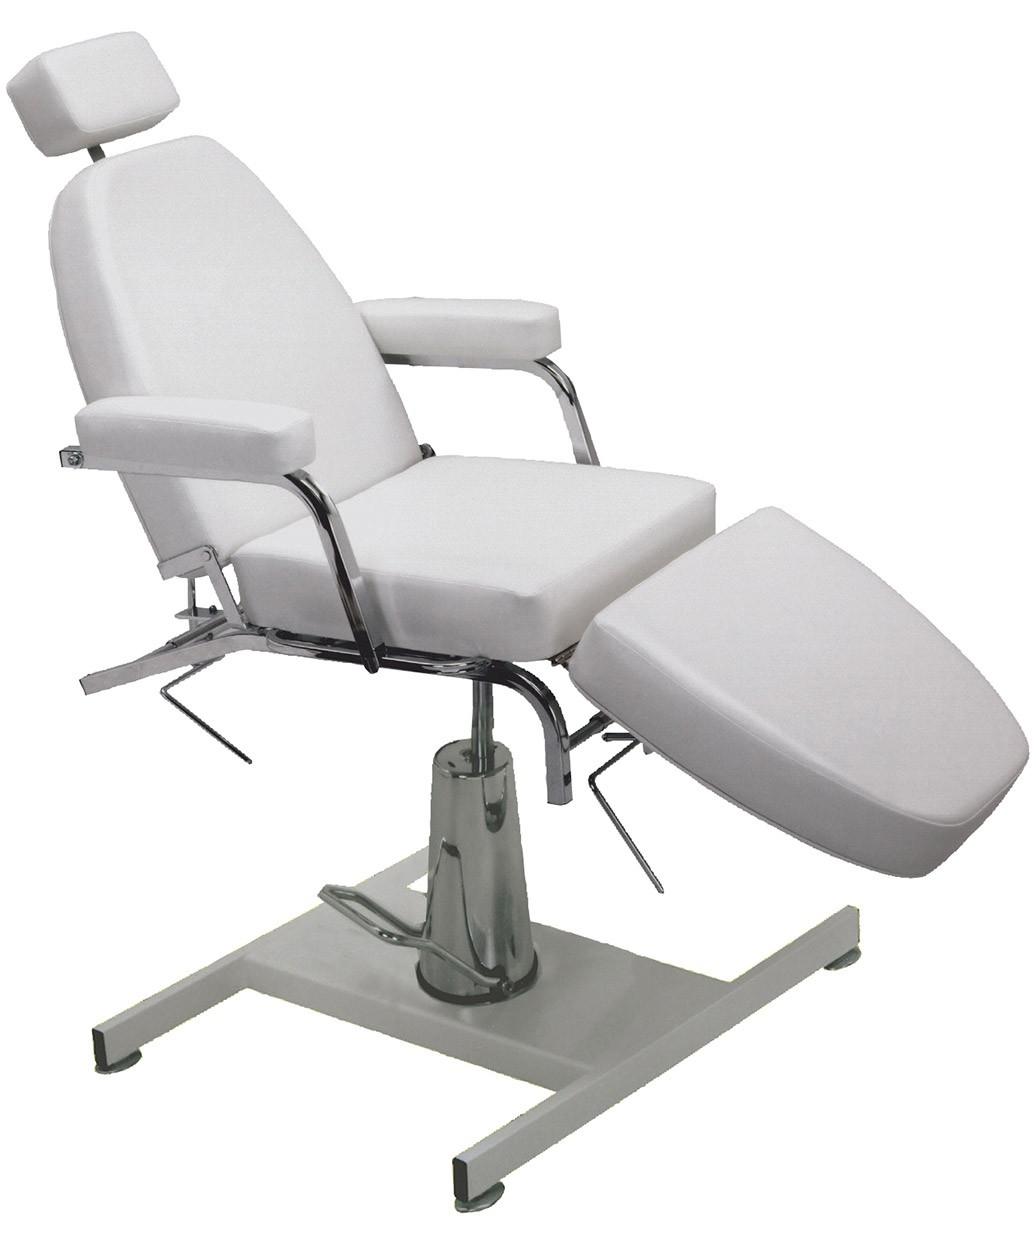 Pibbs Hf809 Hydraulic Facial Chair